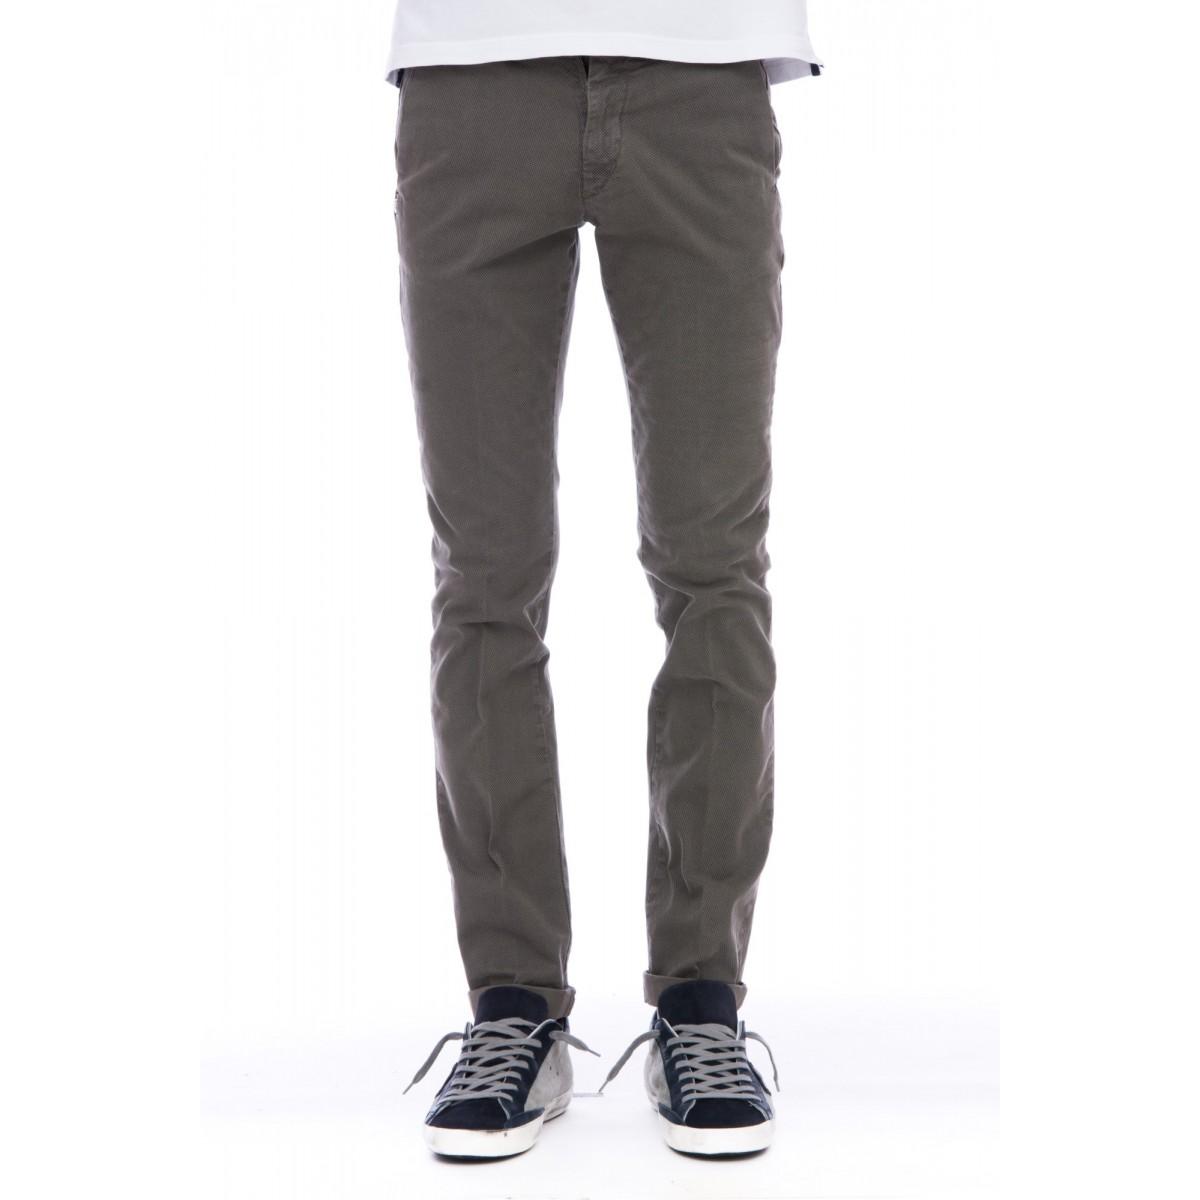 Pantalone uomo 40 weft - Lenny 8757 lavorato